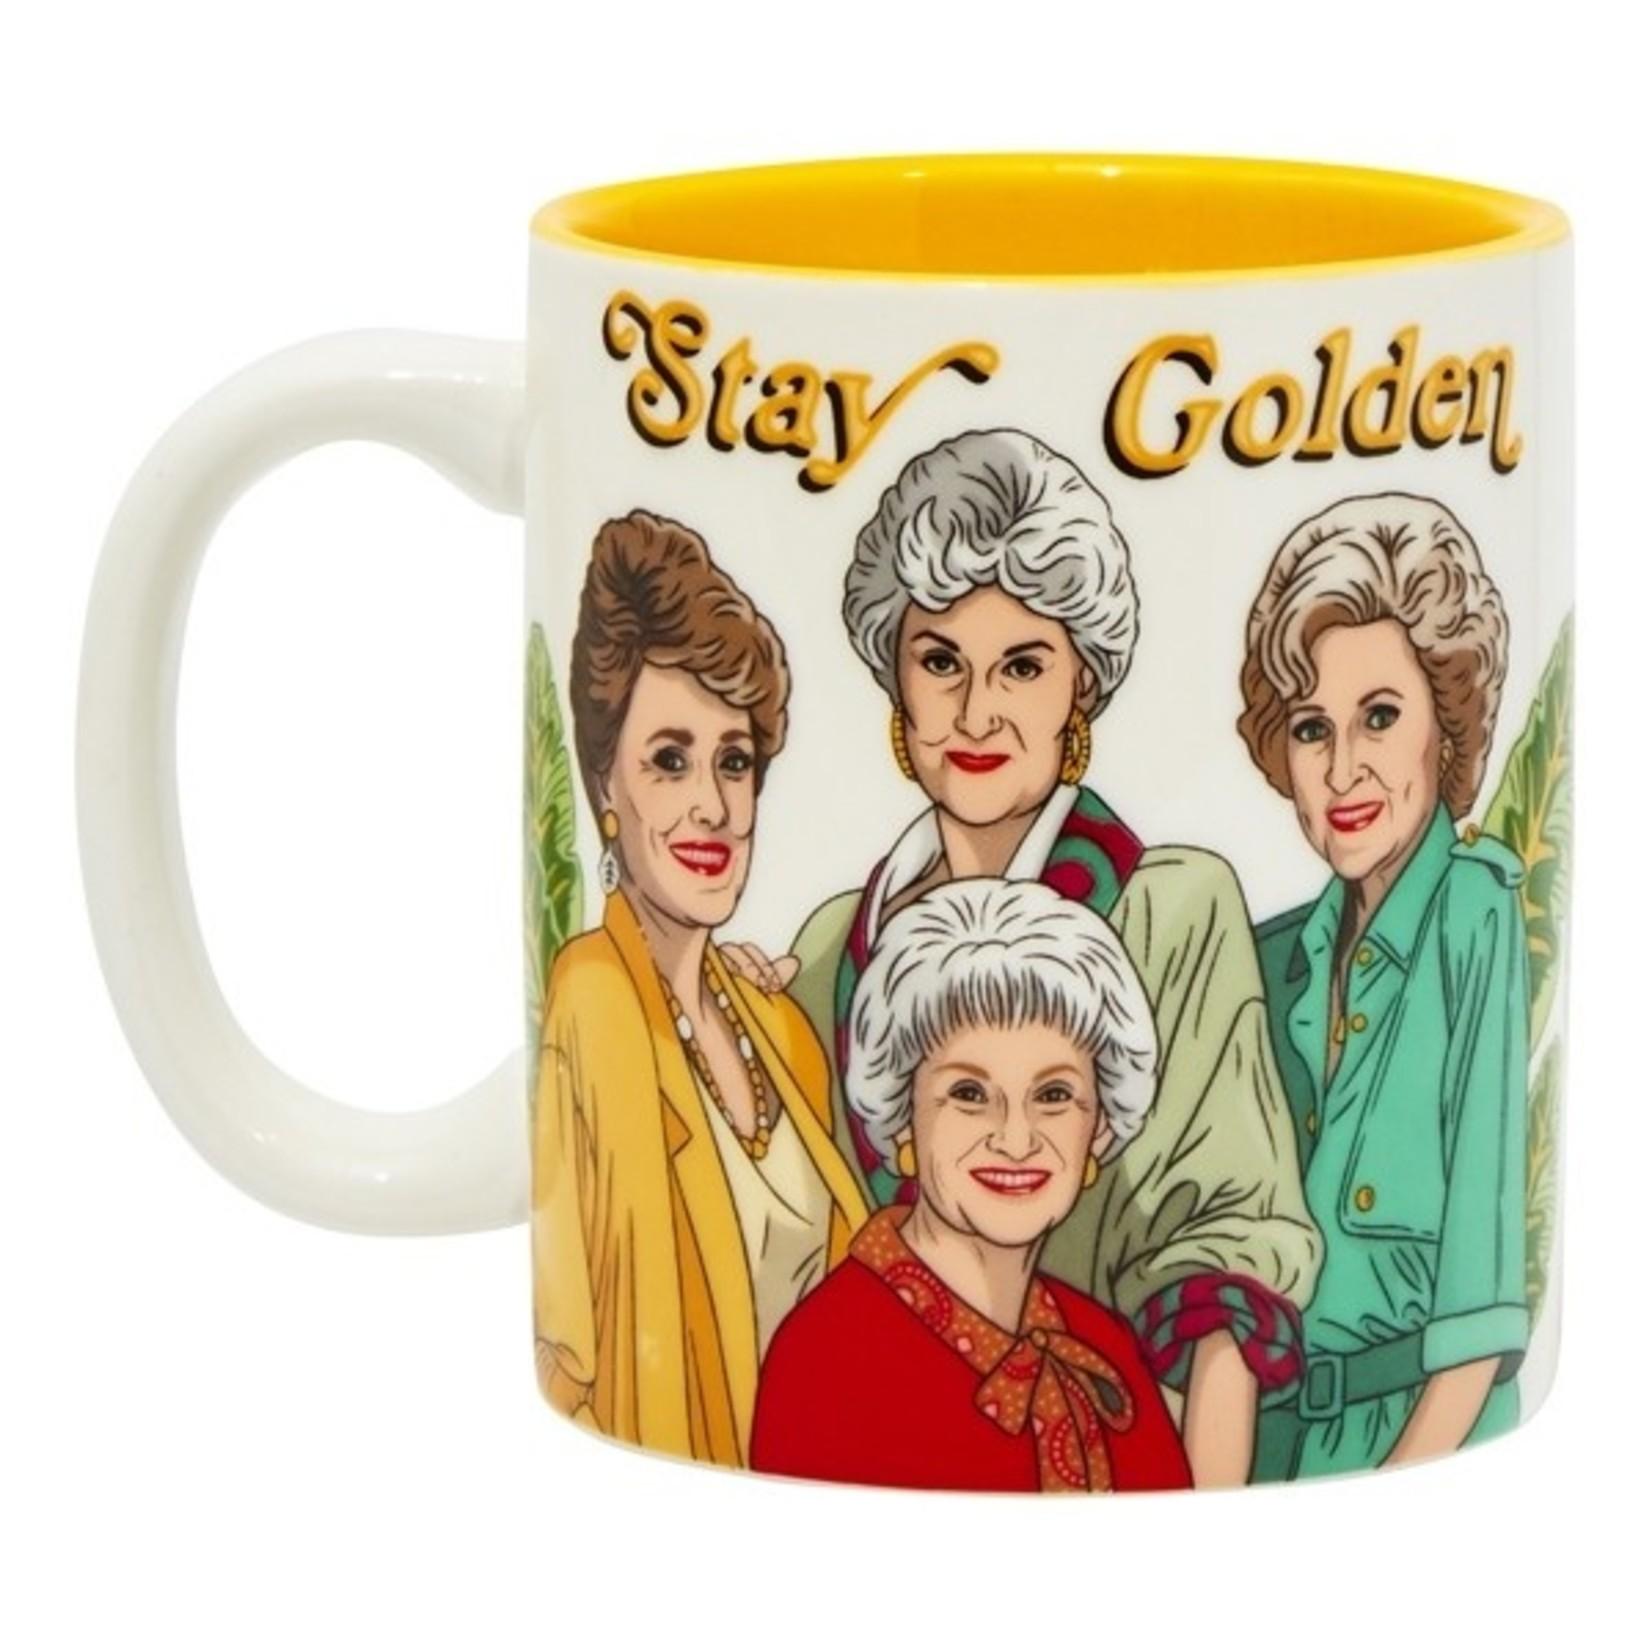 The Found Golden Girls Mug